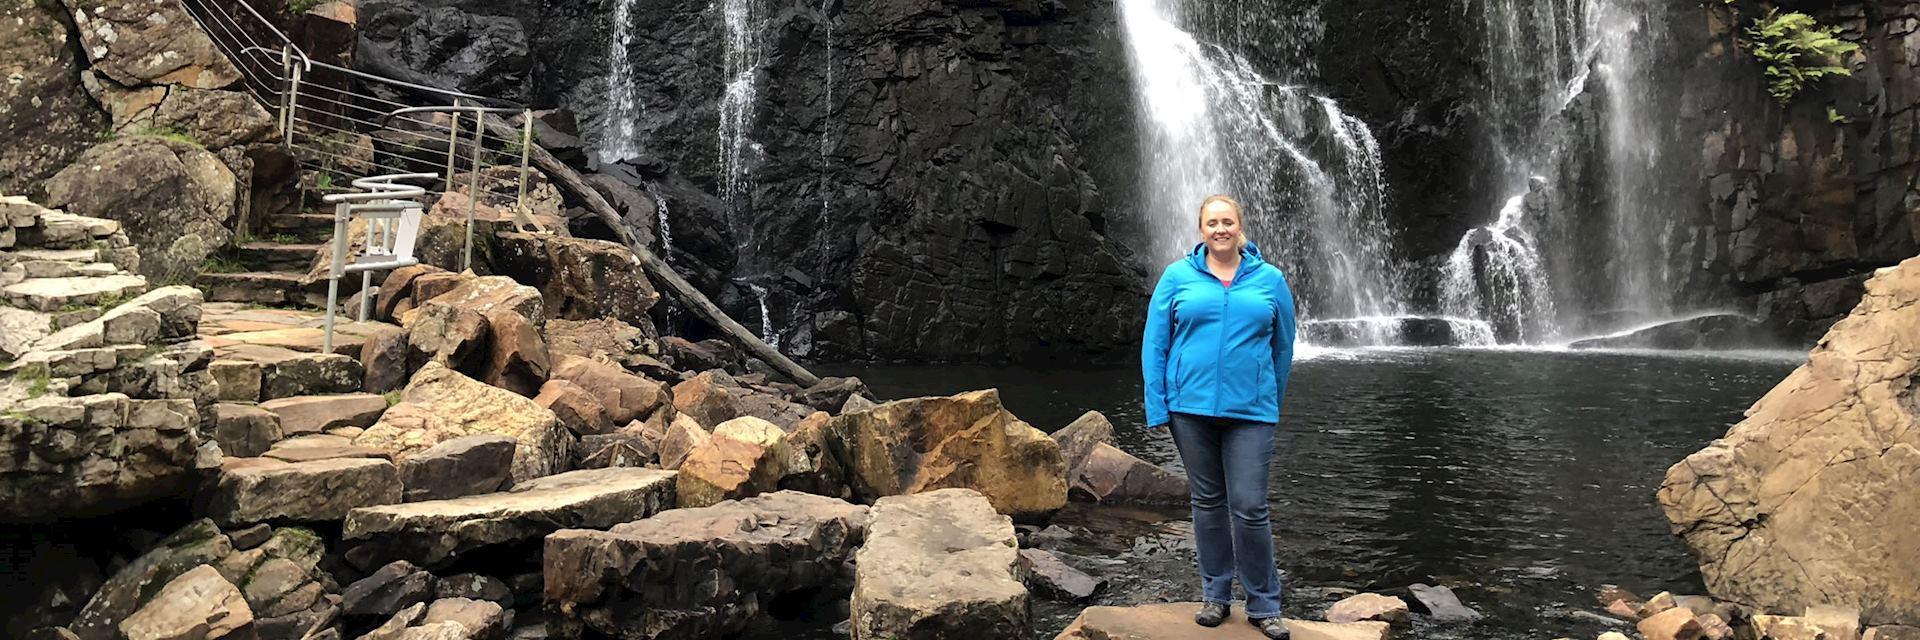 Sian at MacKenzie Falls in the Grampians, Australia